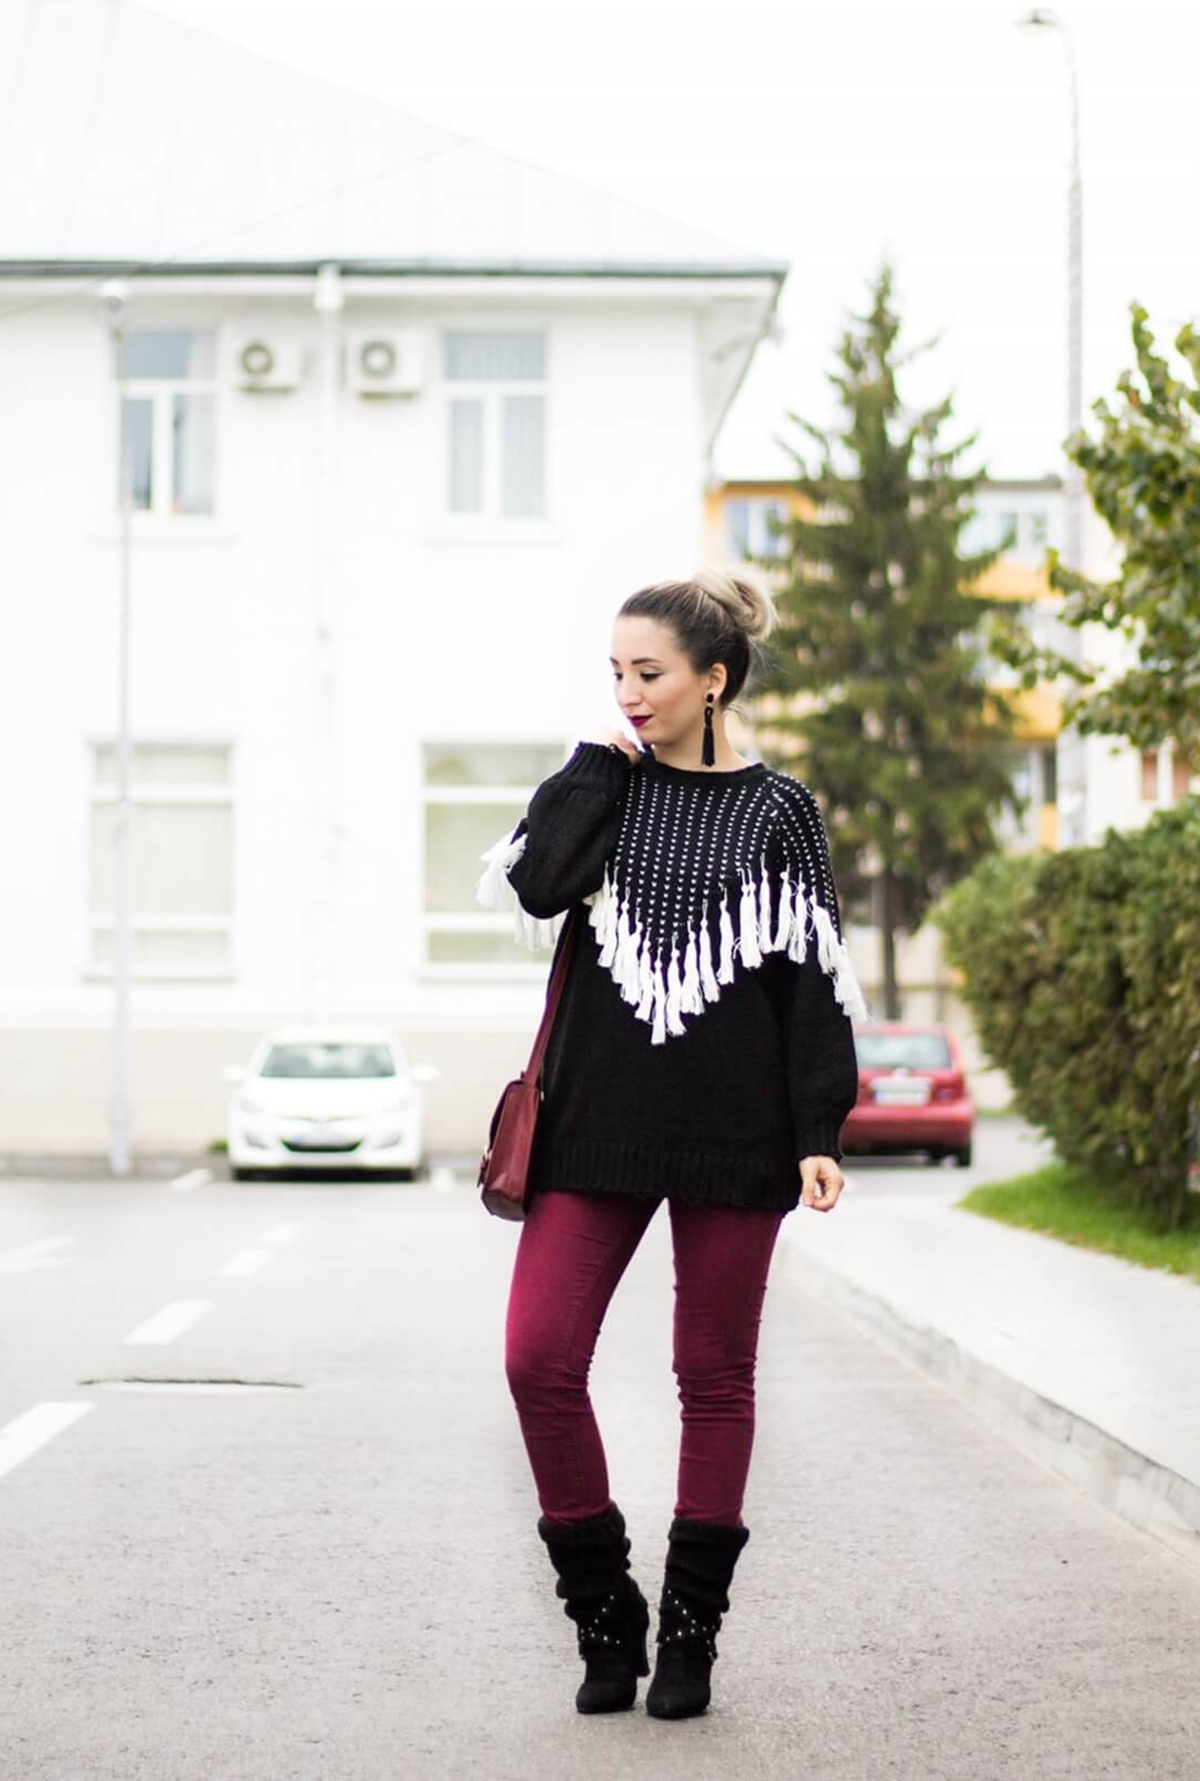 Street style: tassels sweater, black and white, burgundy skinny jeans, pants, burgundy bag, tassel earrings, zaful, fashion blogger andreea ristea, black boots